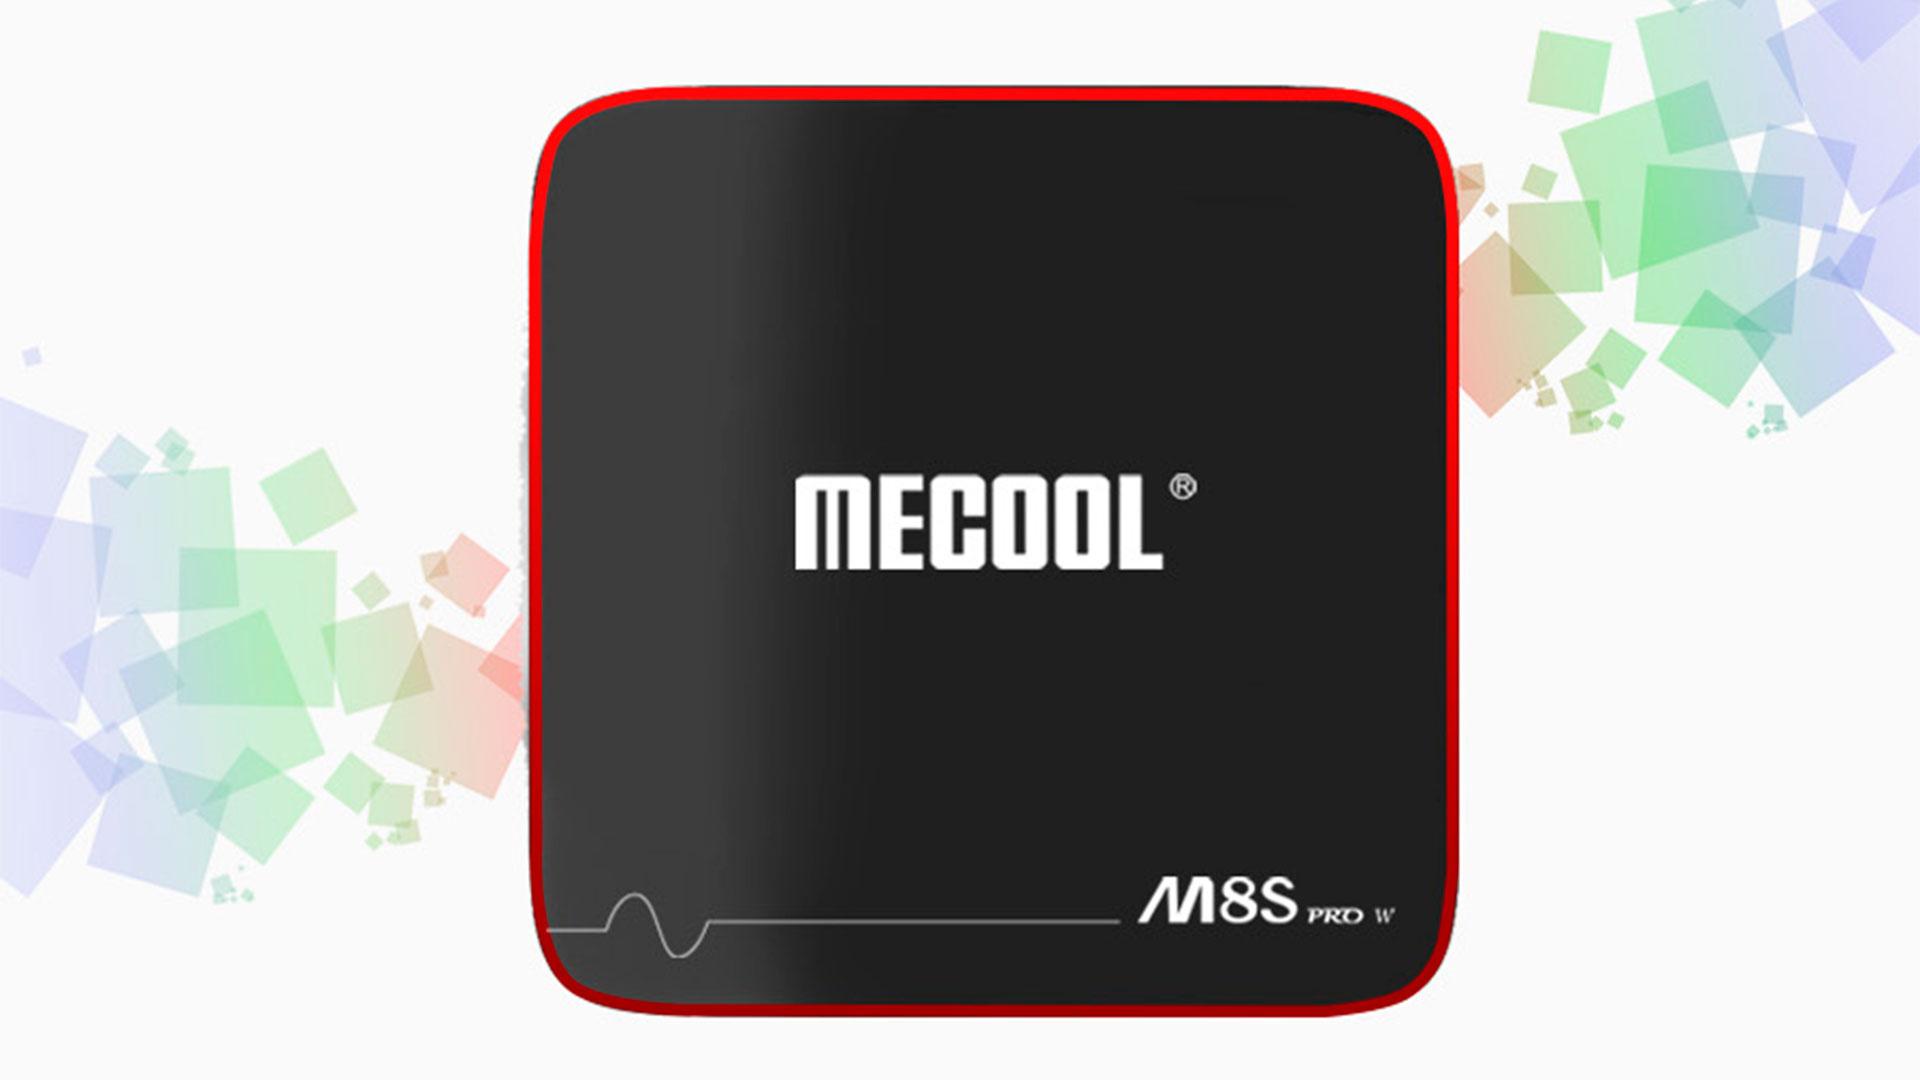 Análisis - Review] Mecool M8S PRO W